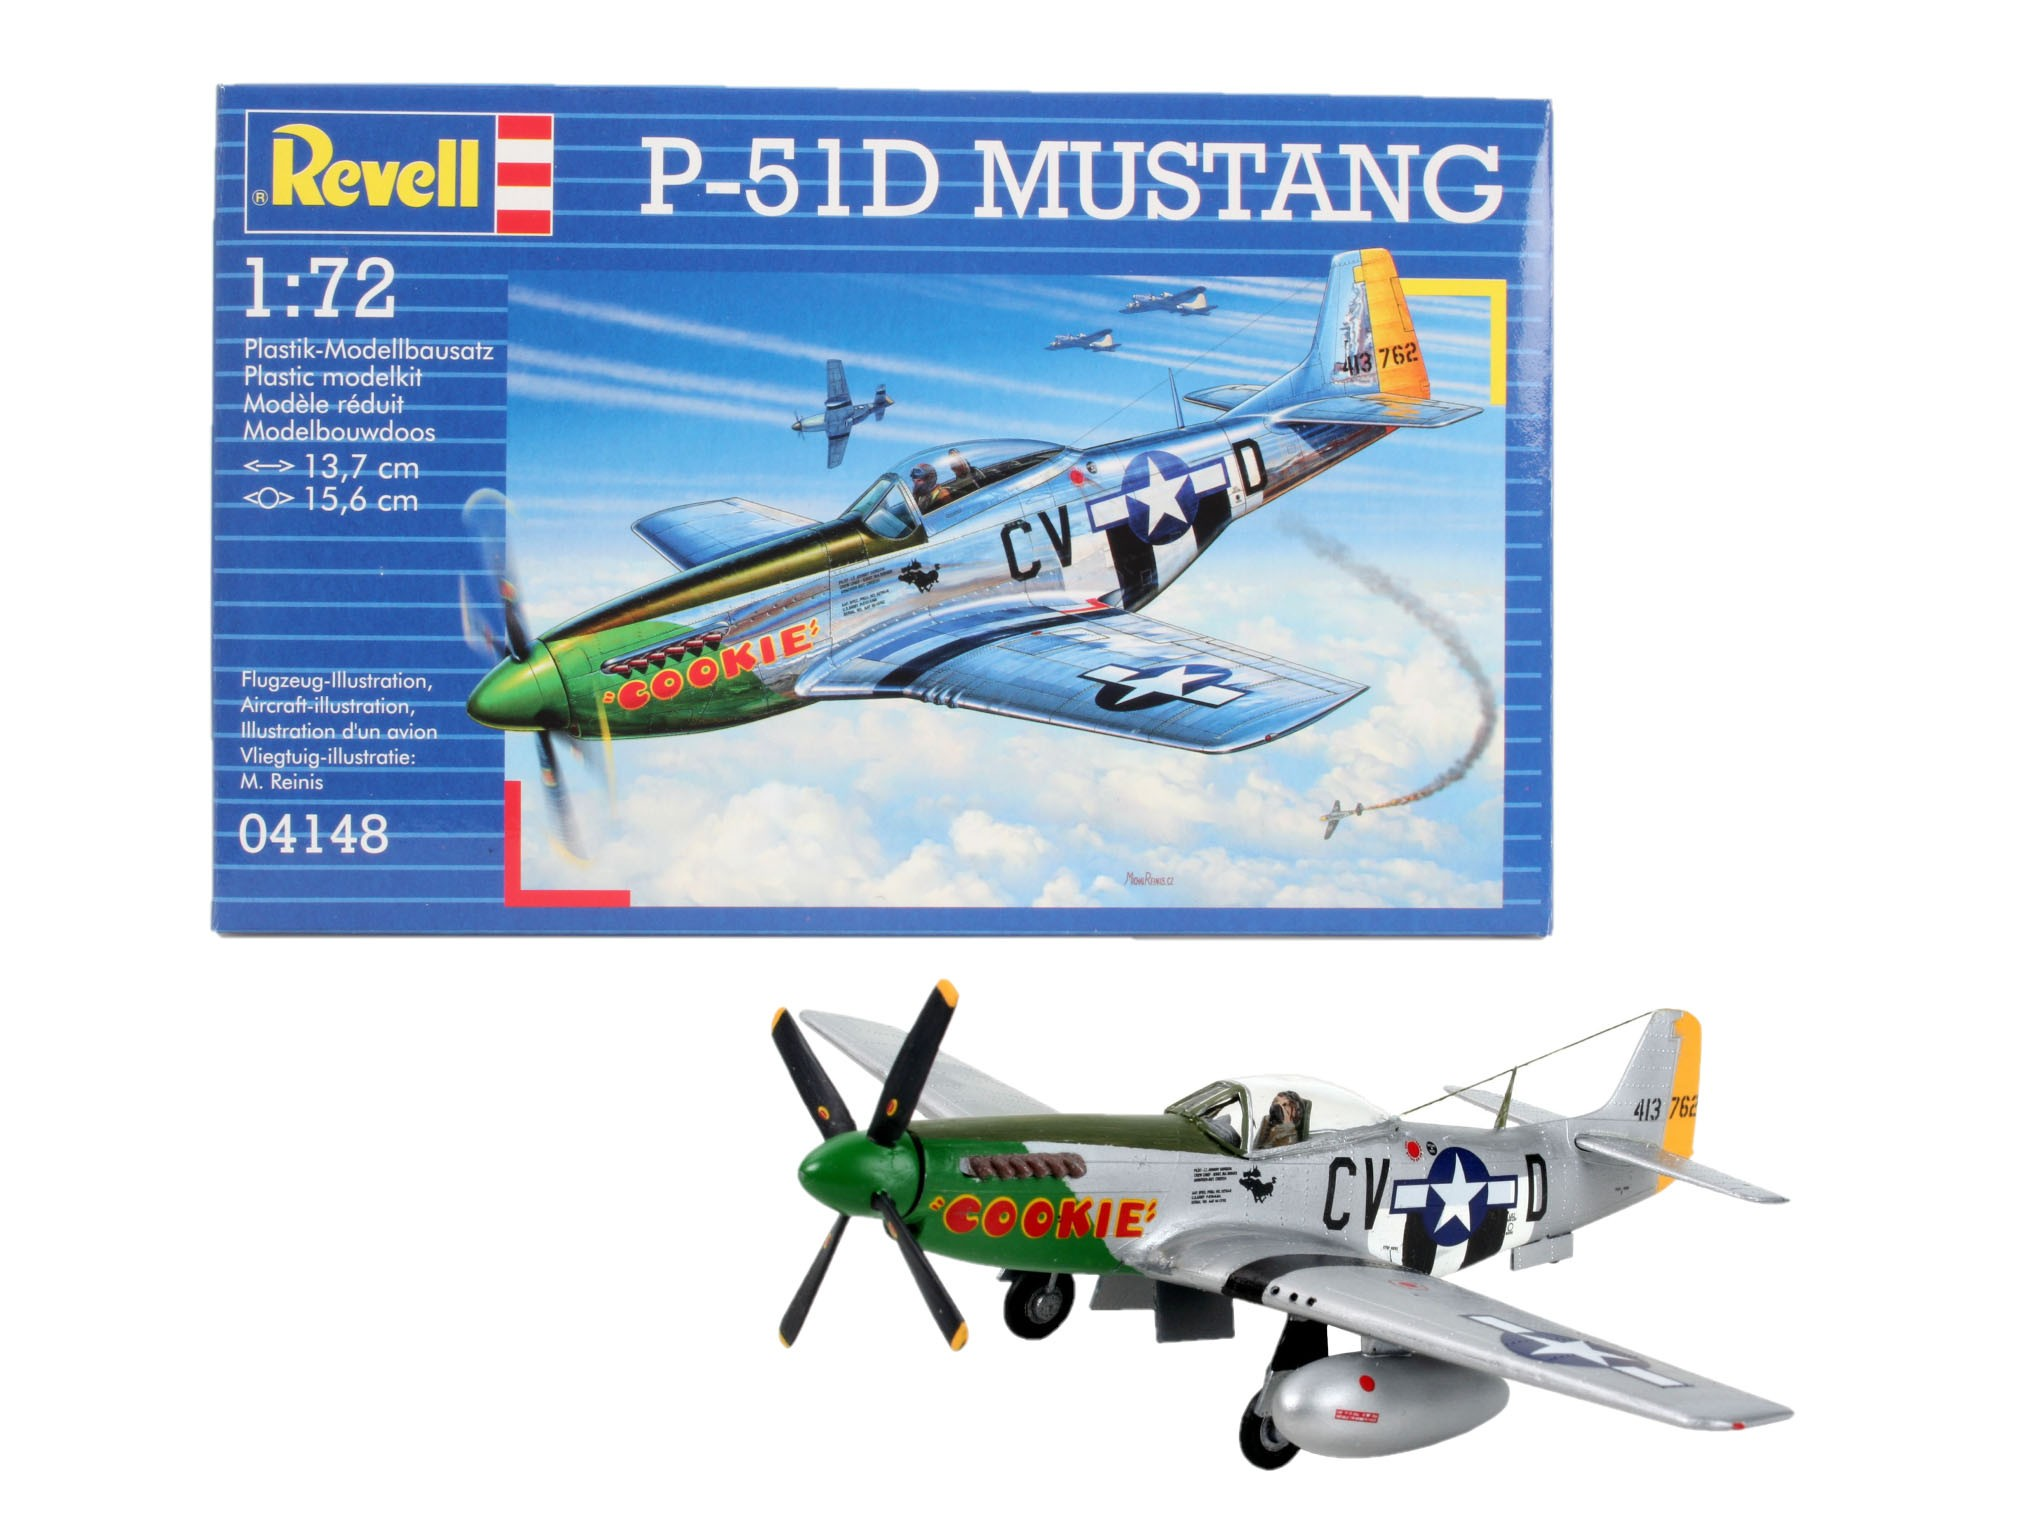 Revell 04148 P-51D Mustang 1:72